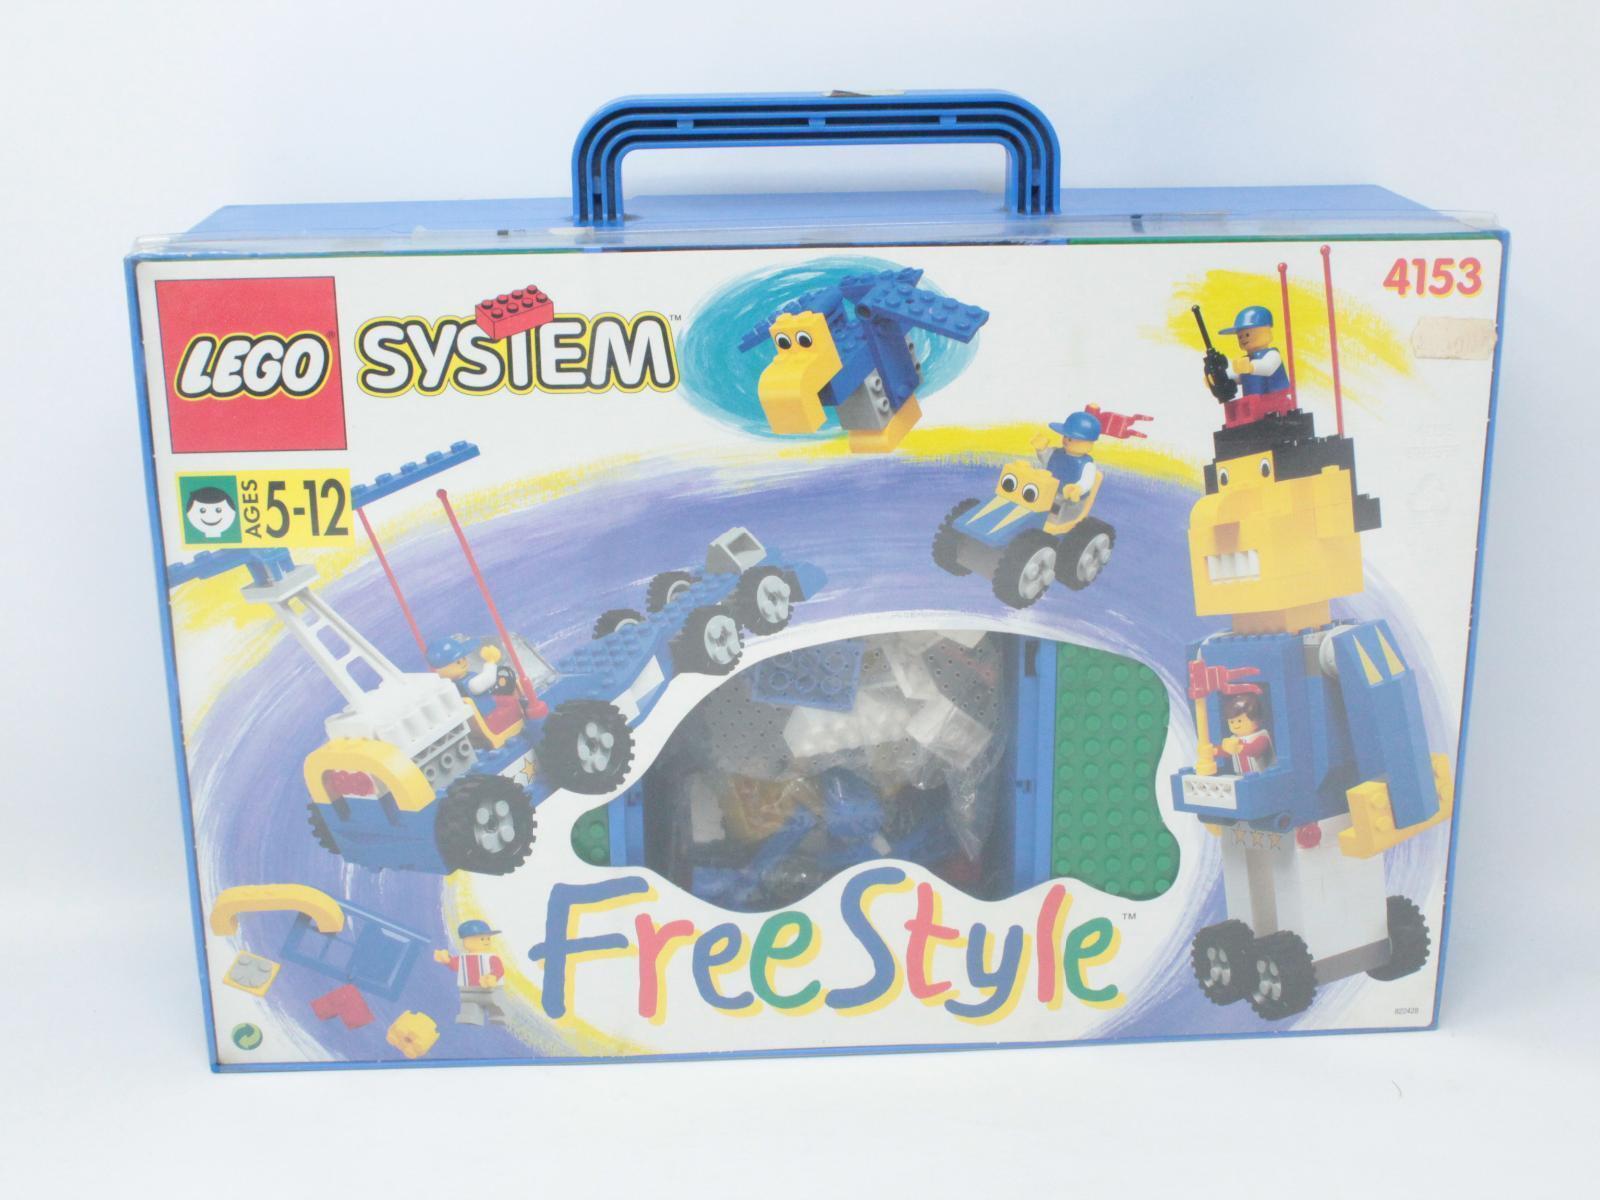 LEGO SYSTEM FREE STYLE LEGO 4153 FONDO MAGAZZINO [P09-011]